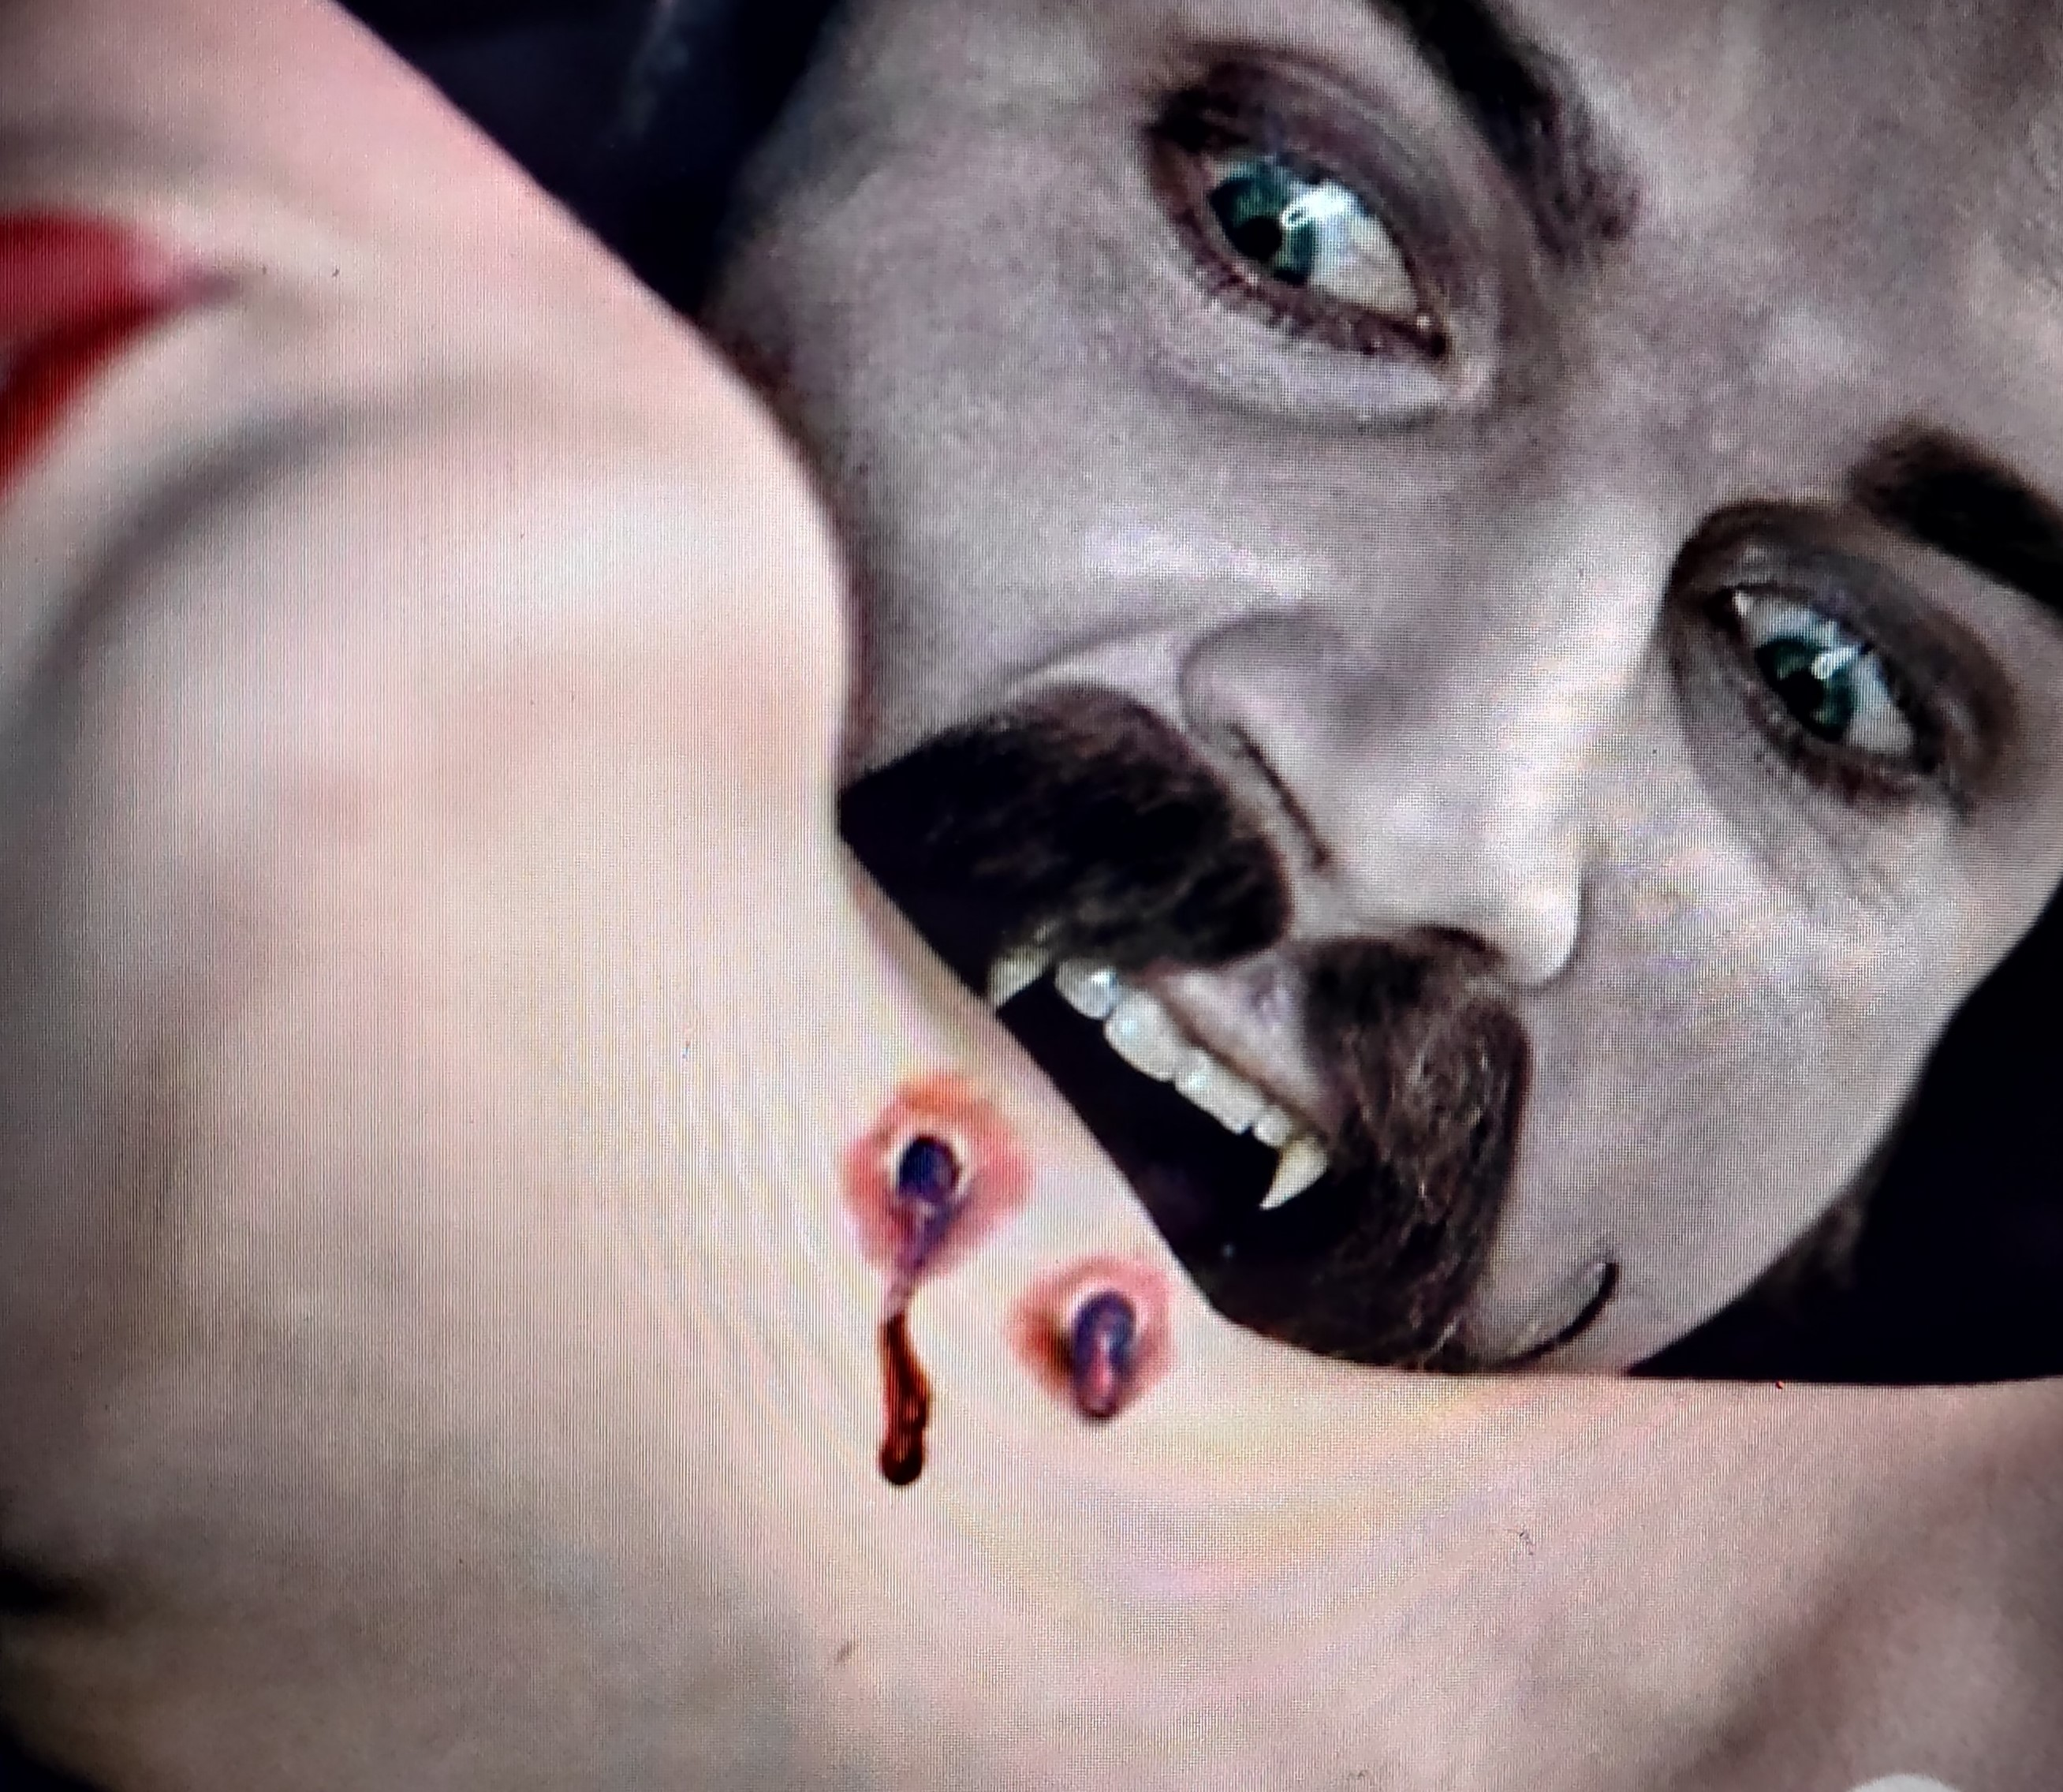 Dracula neck bite